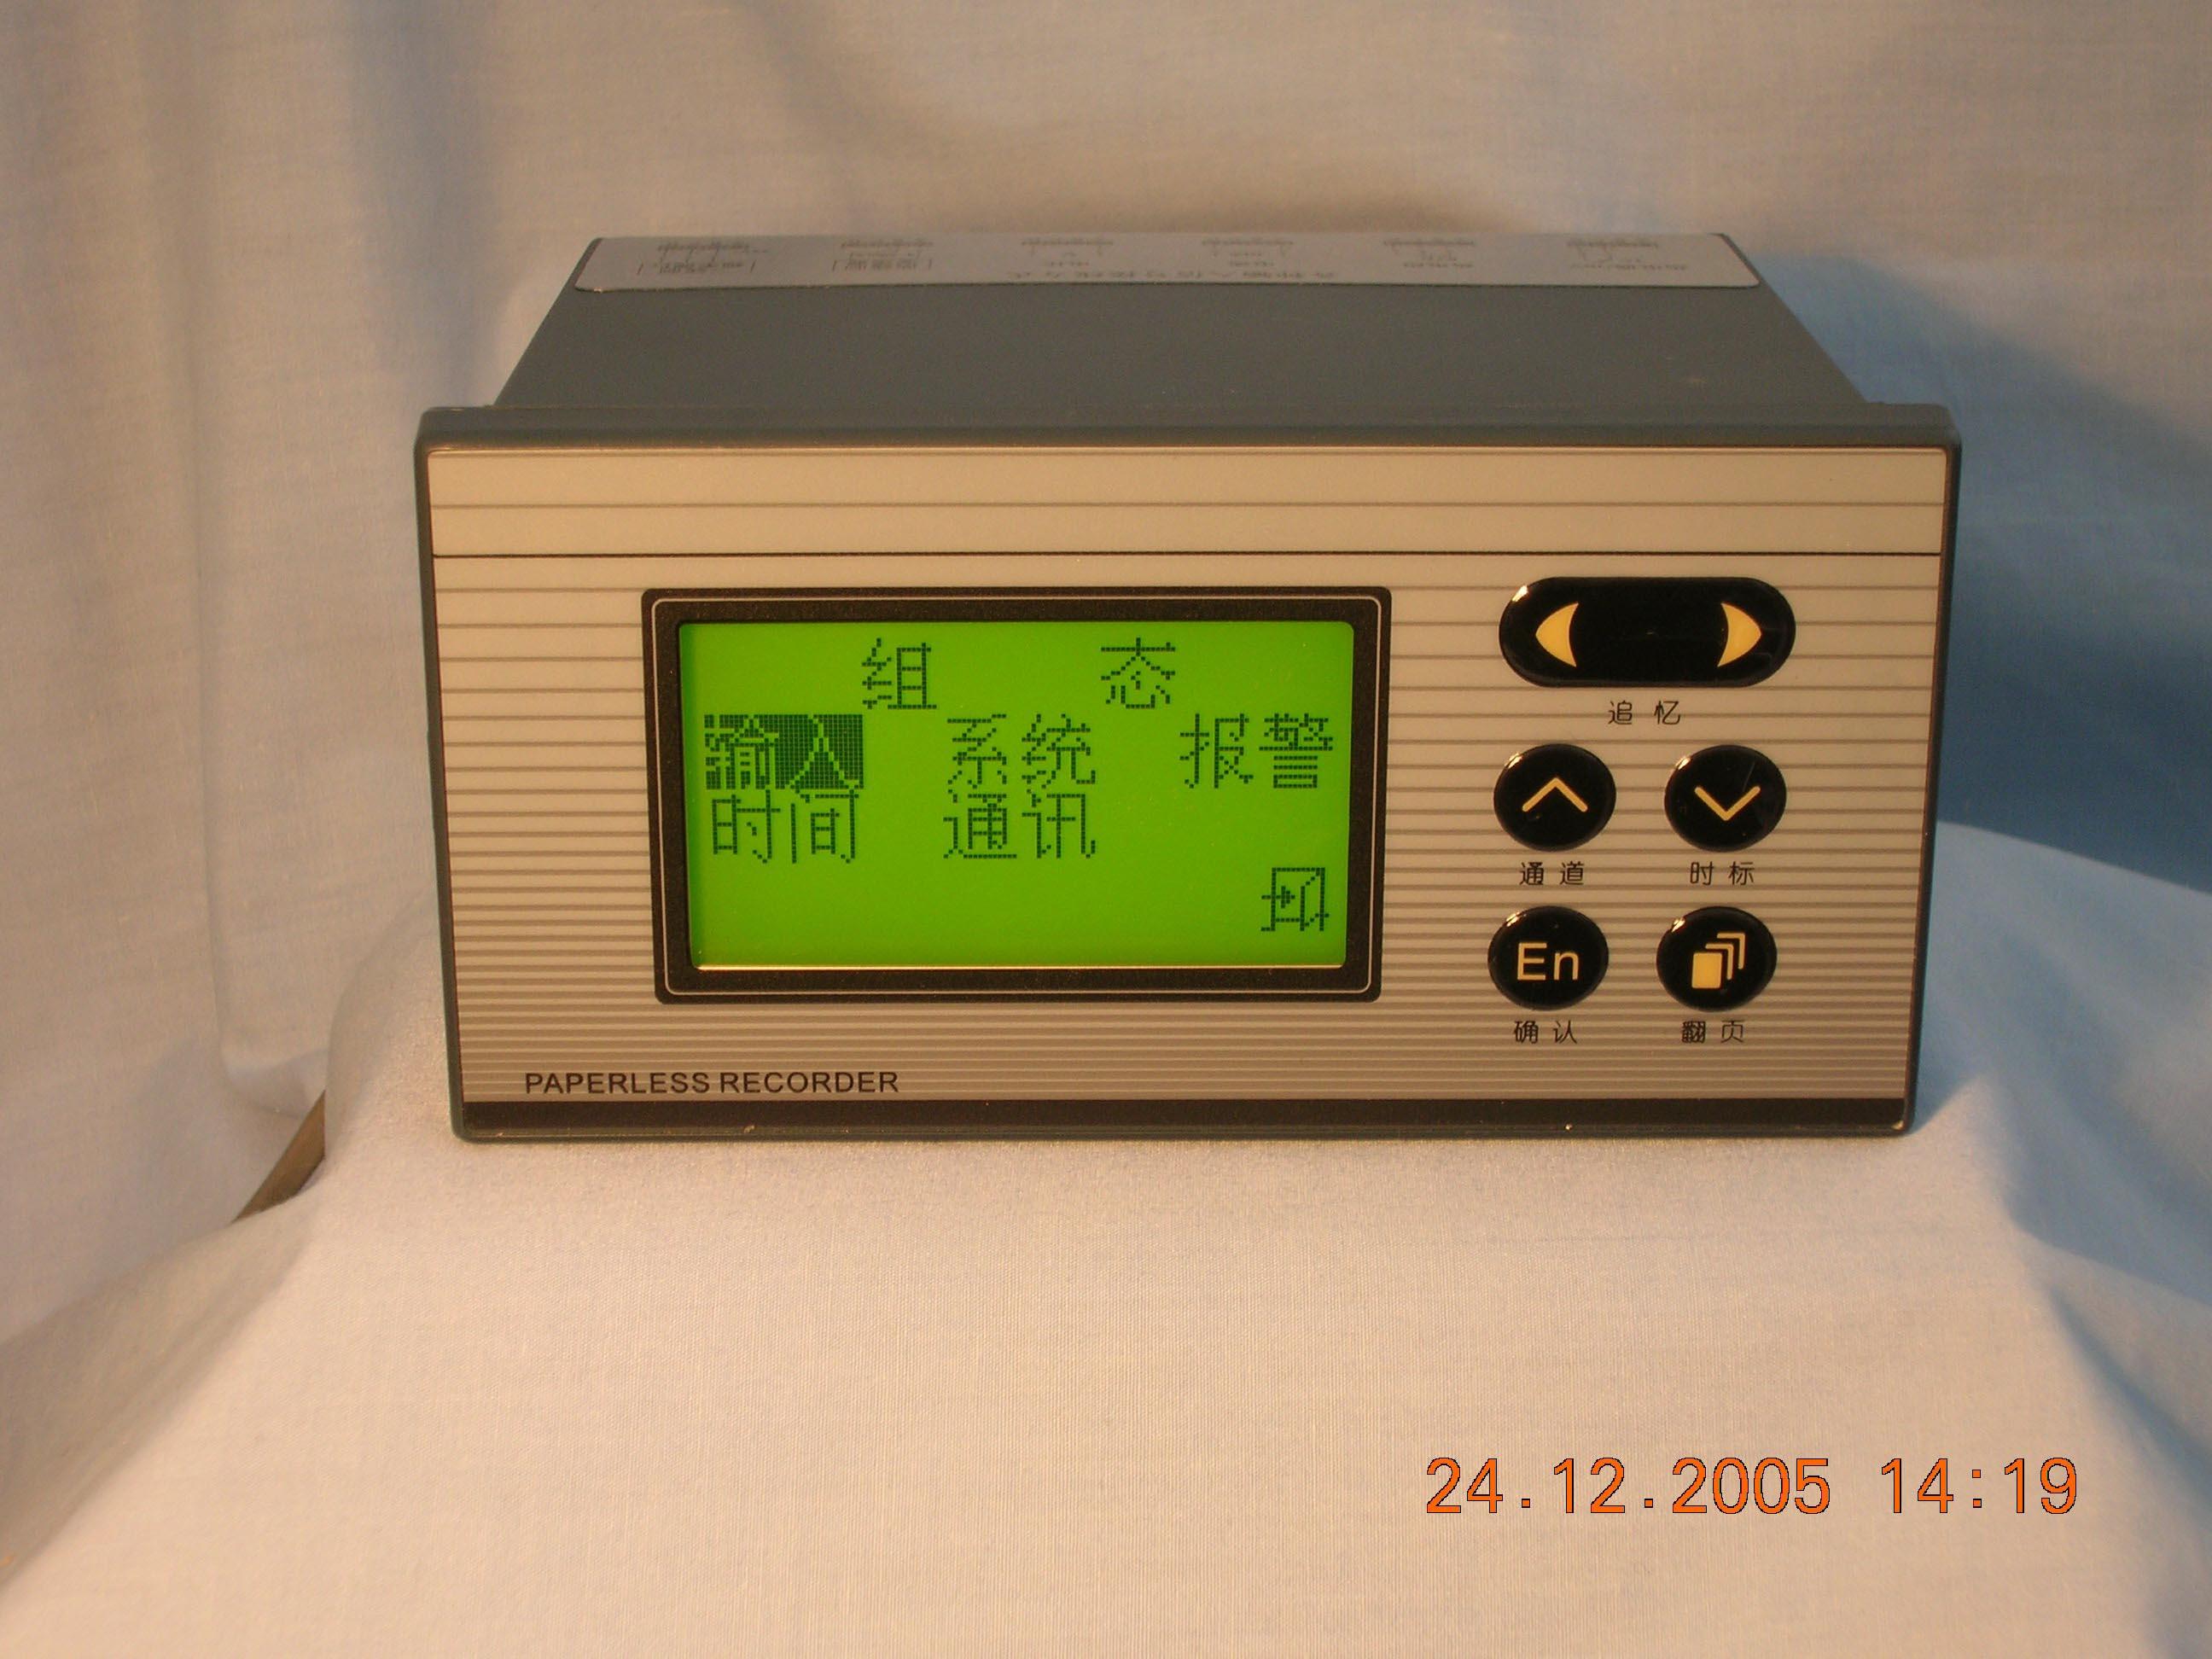 mc-200-002.jpg